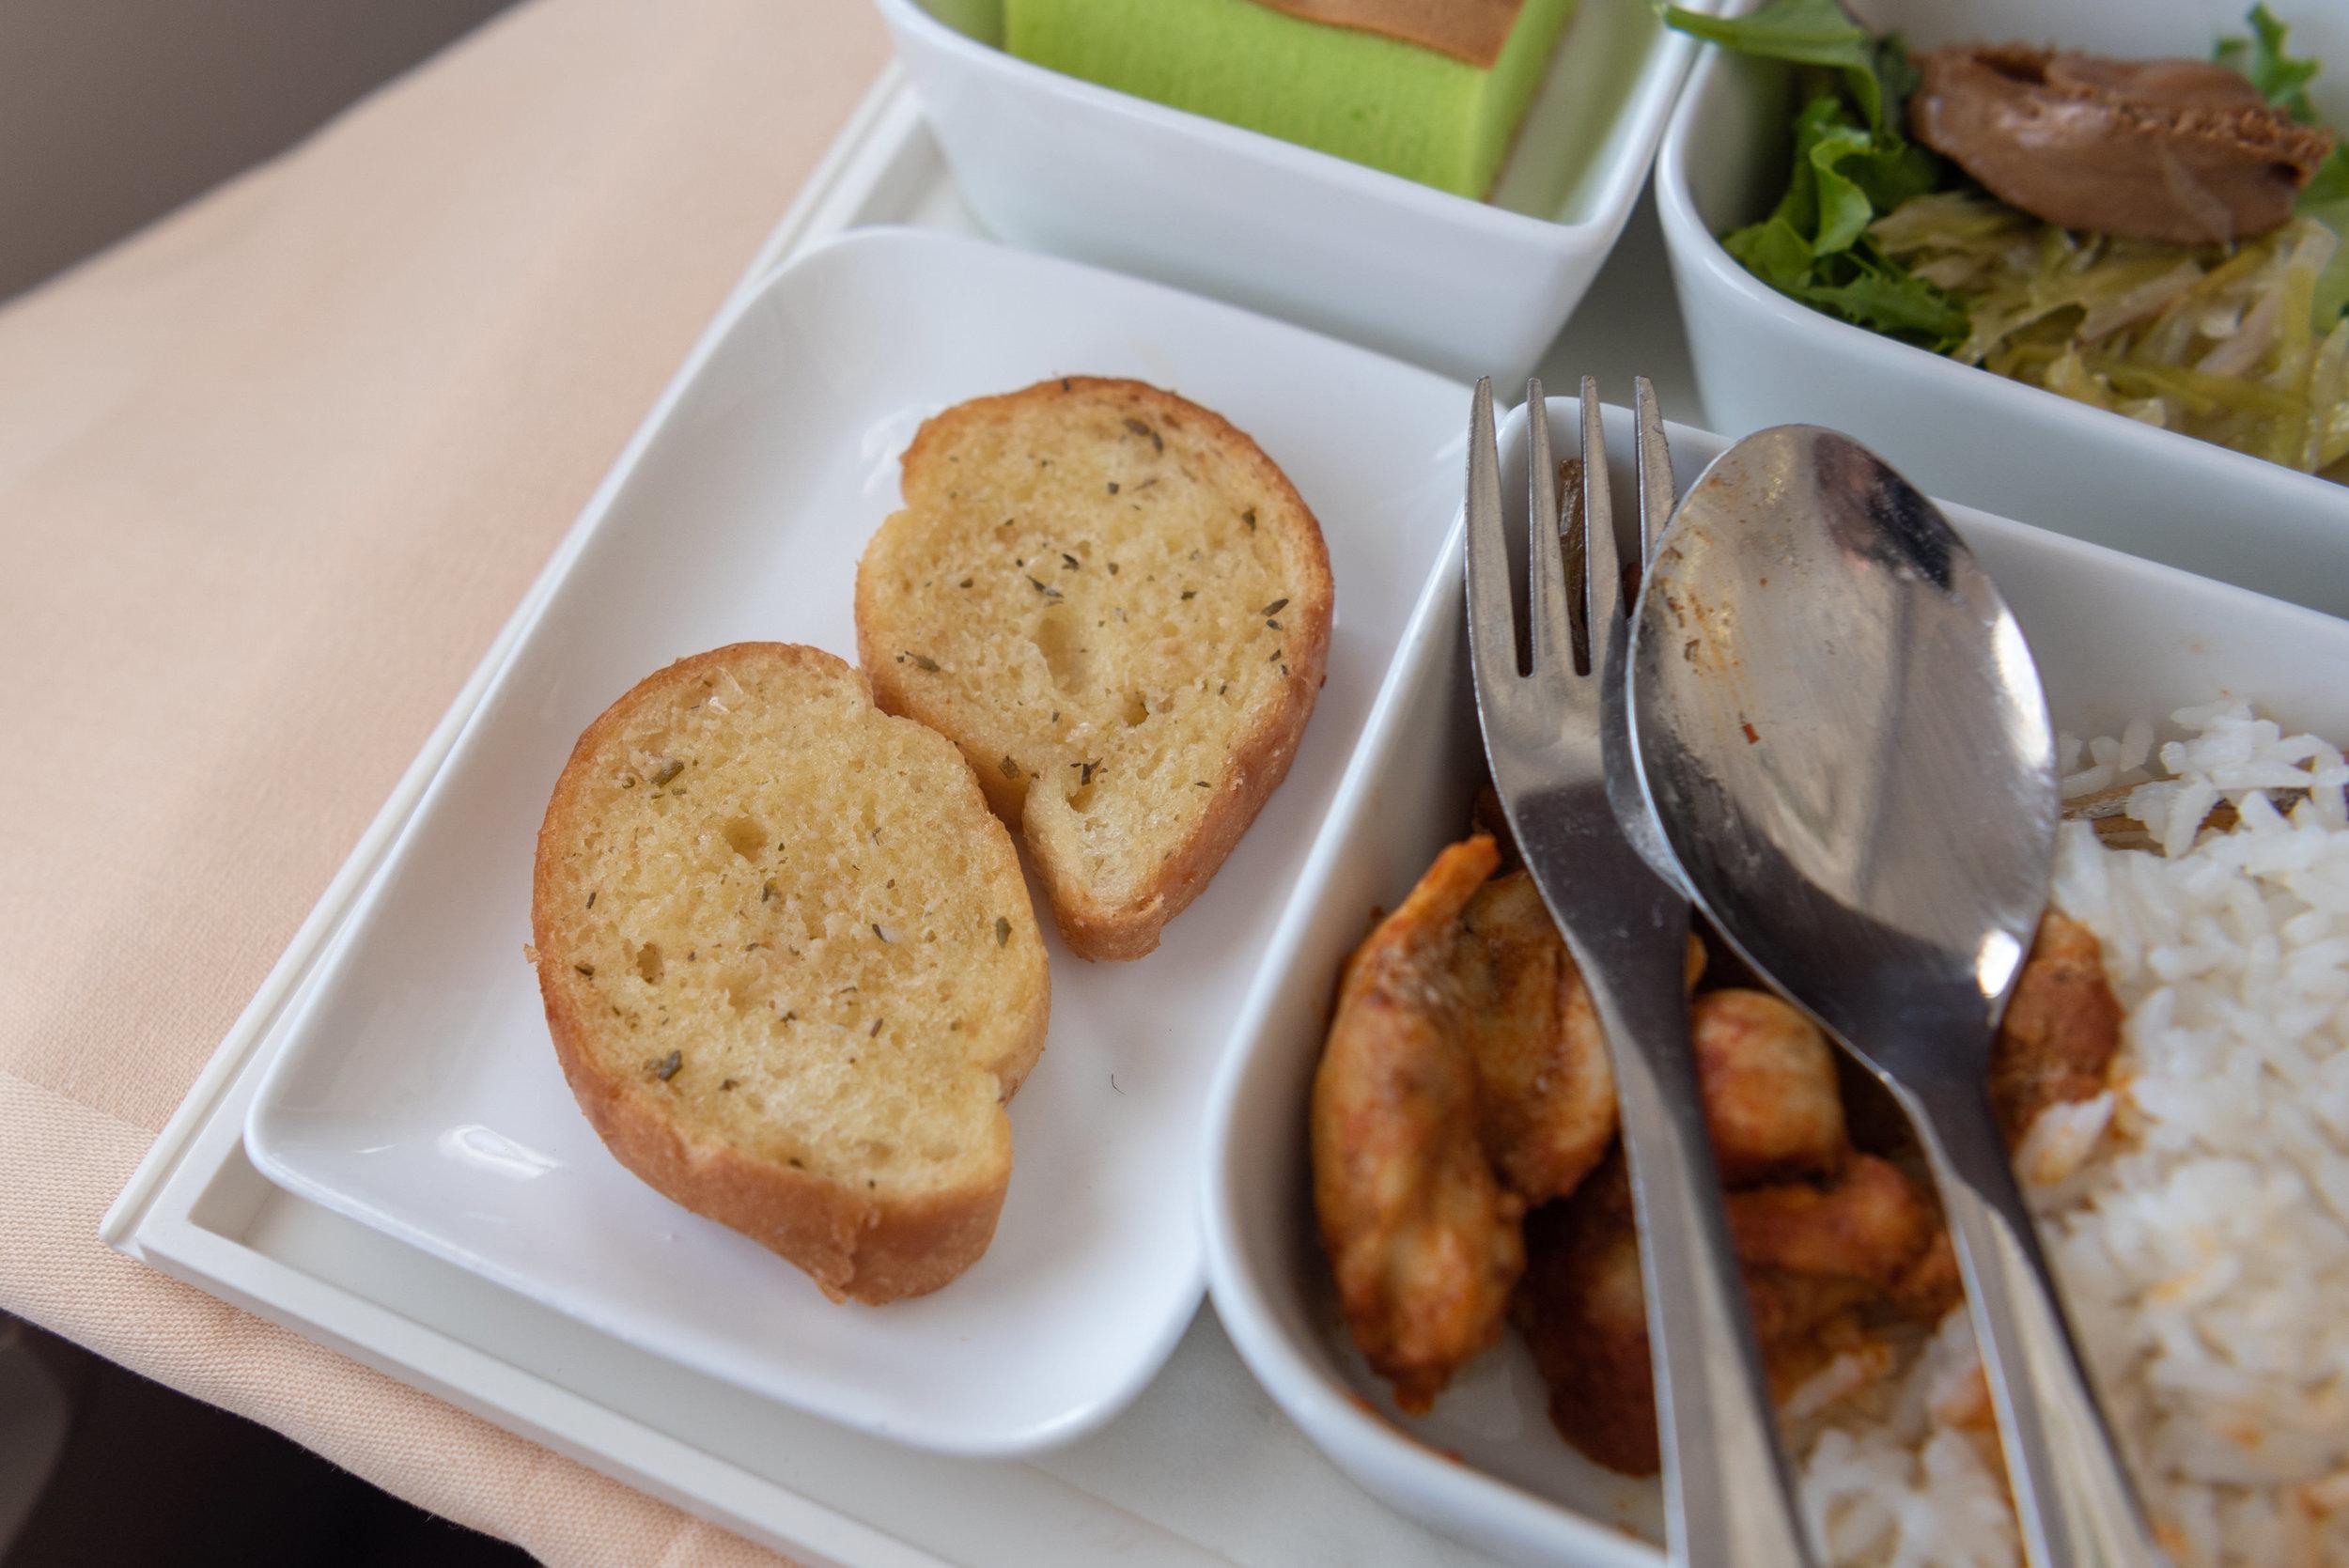 Garlic Bread  SilkAir Business Class MI615 737-800 - REP to SIN